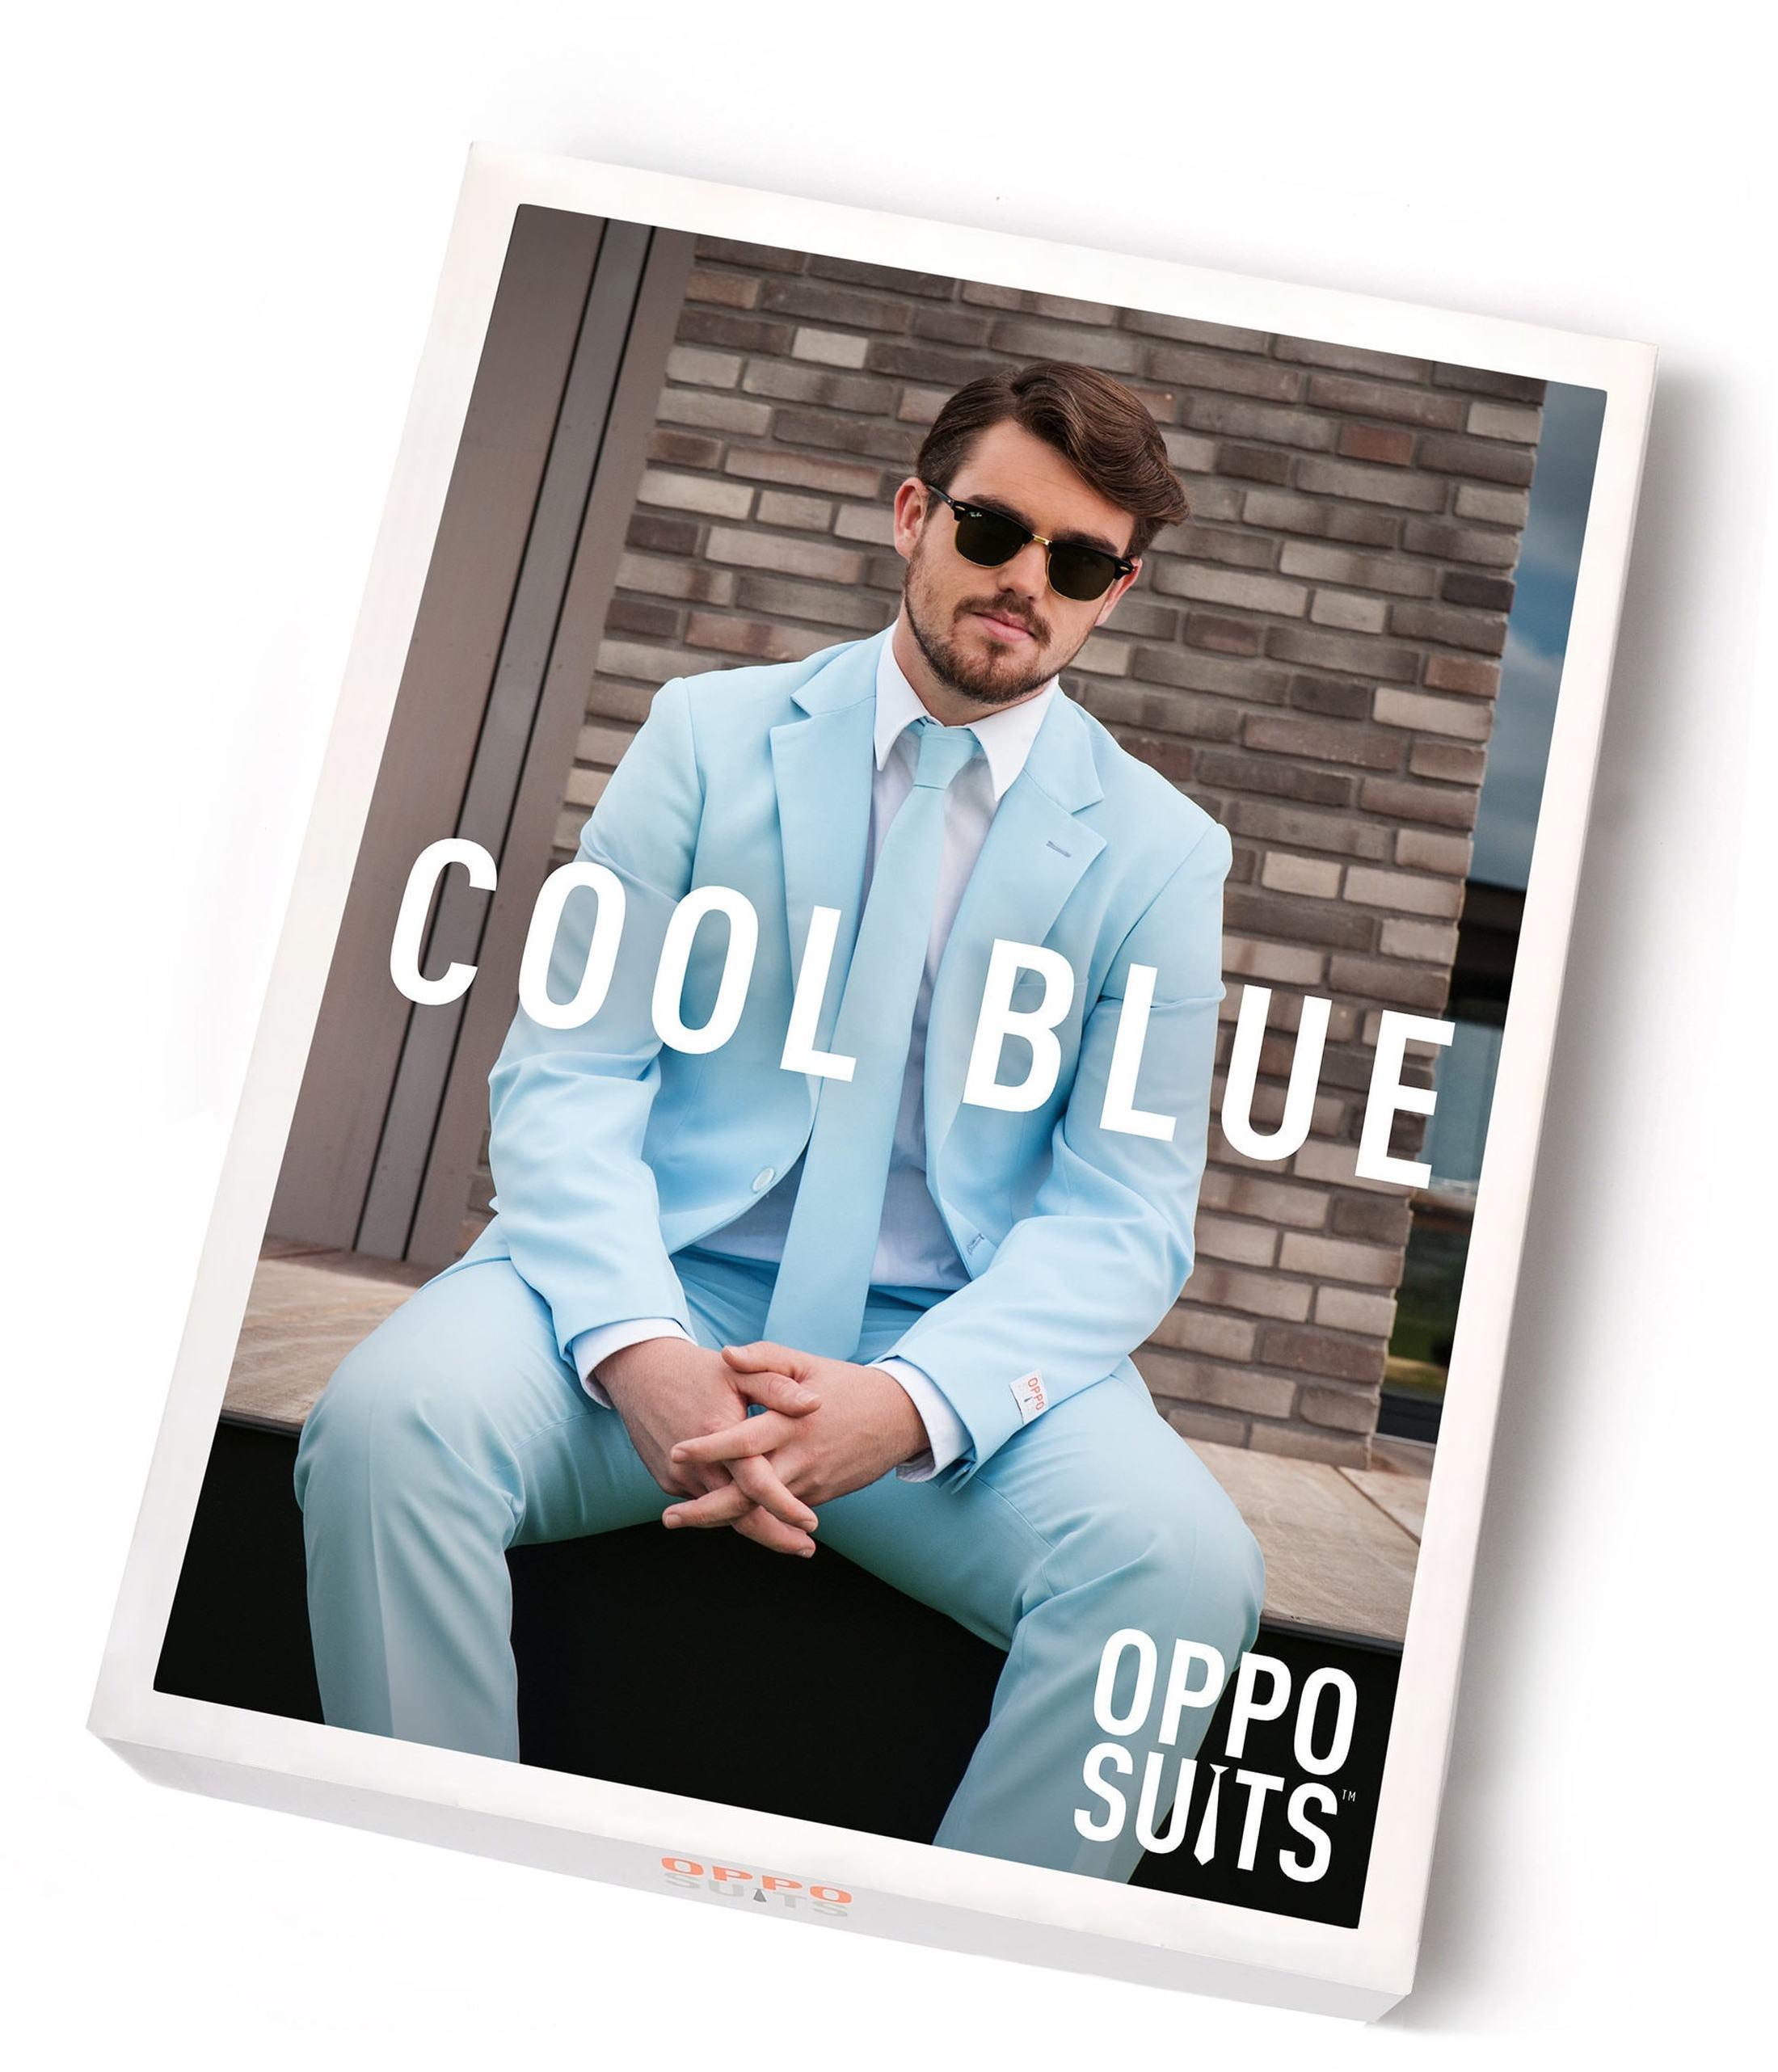 OppoSuits Cool Blue Kostüm foto 4